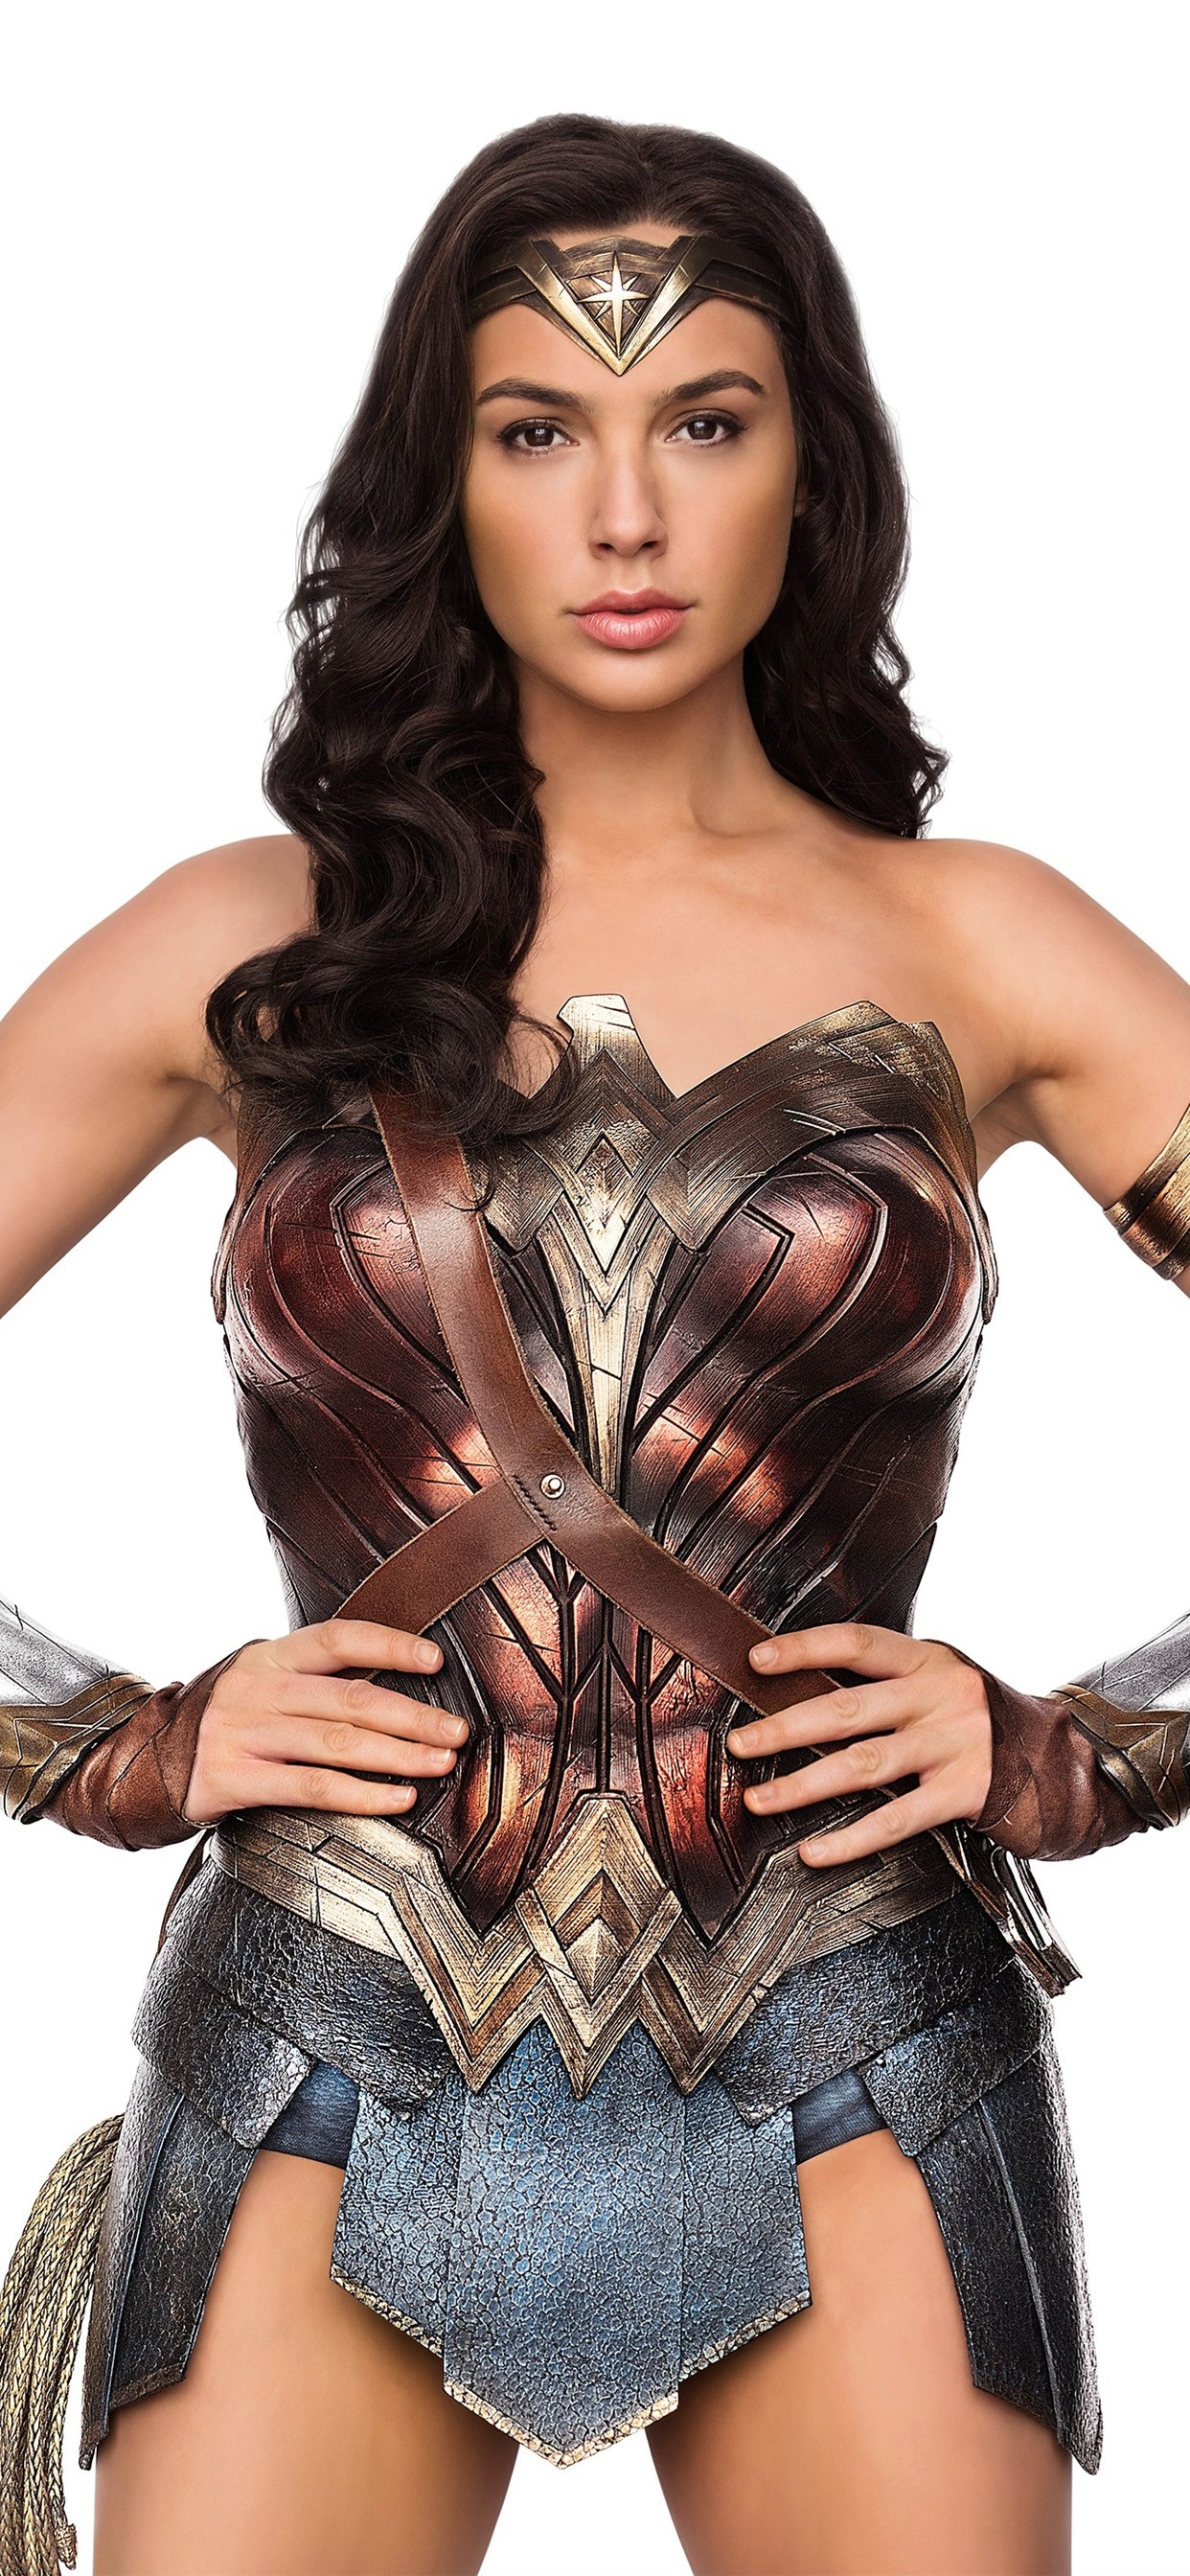 Iphone Wallpaper Wonder Woman, Gal Gadot, White Background